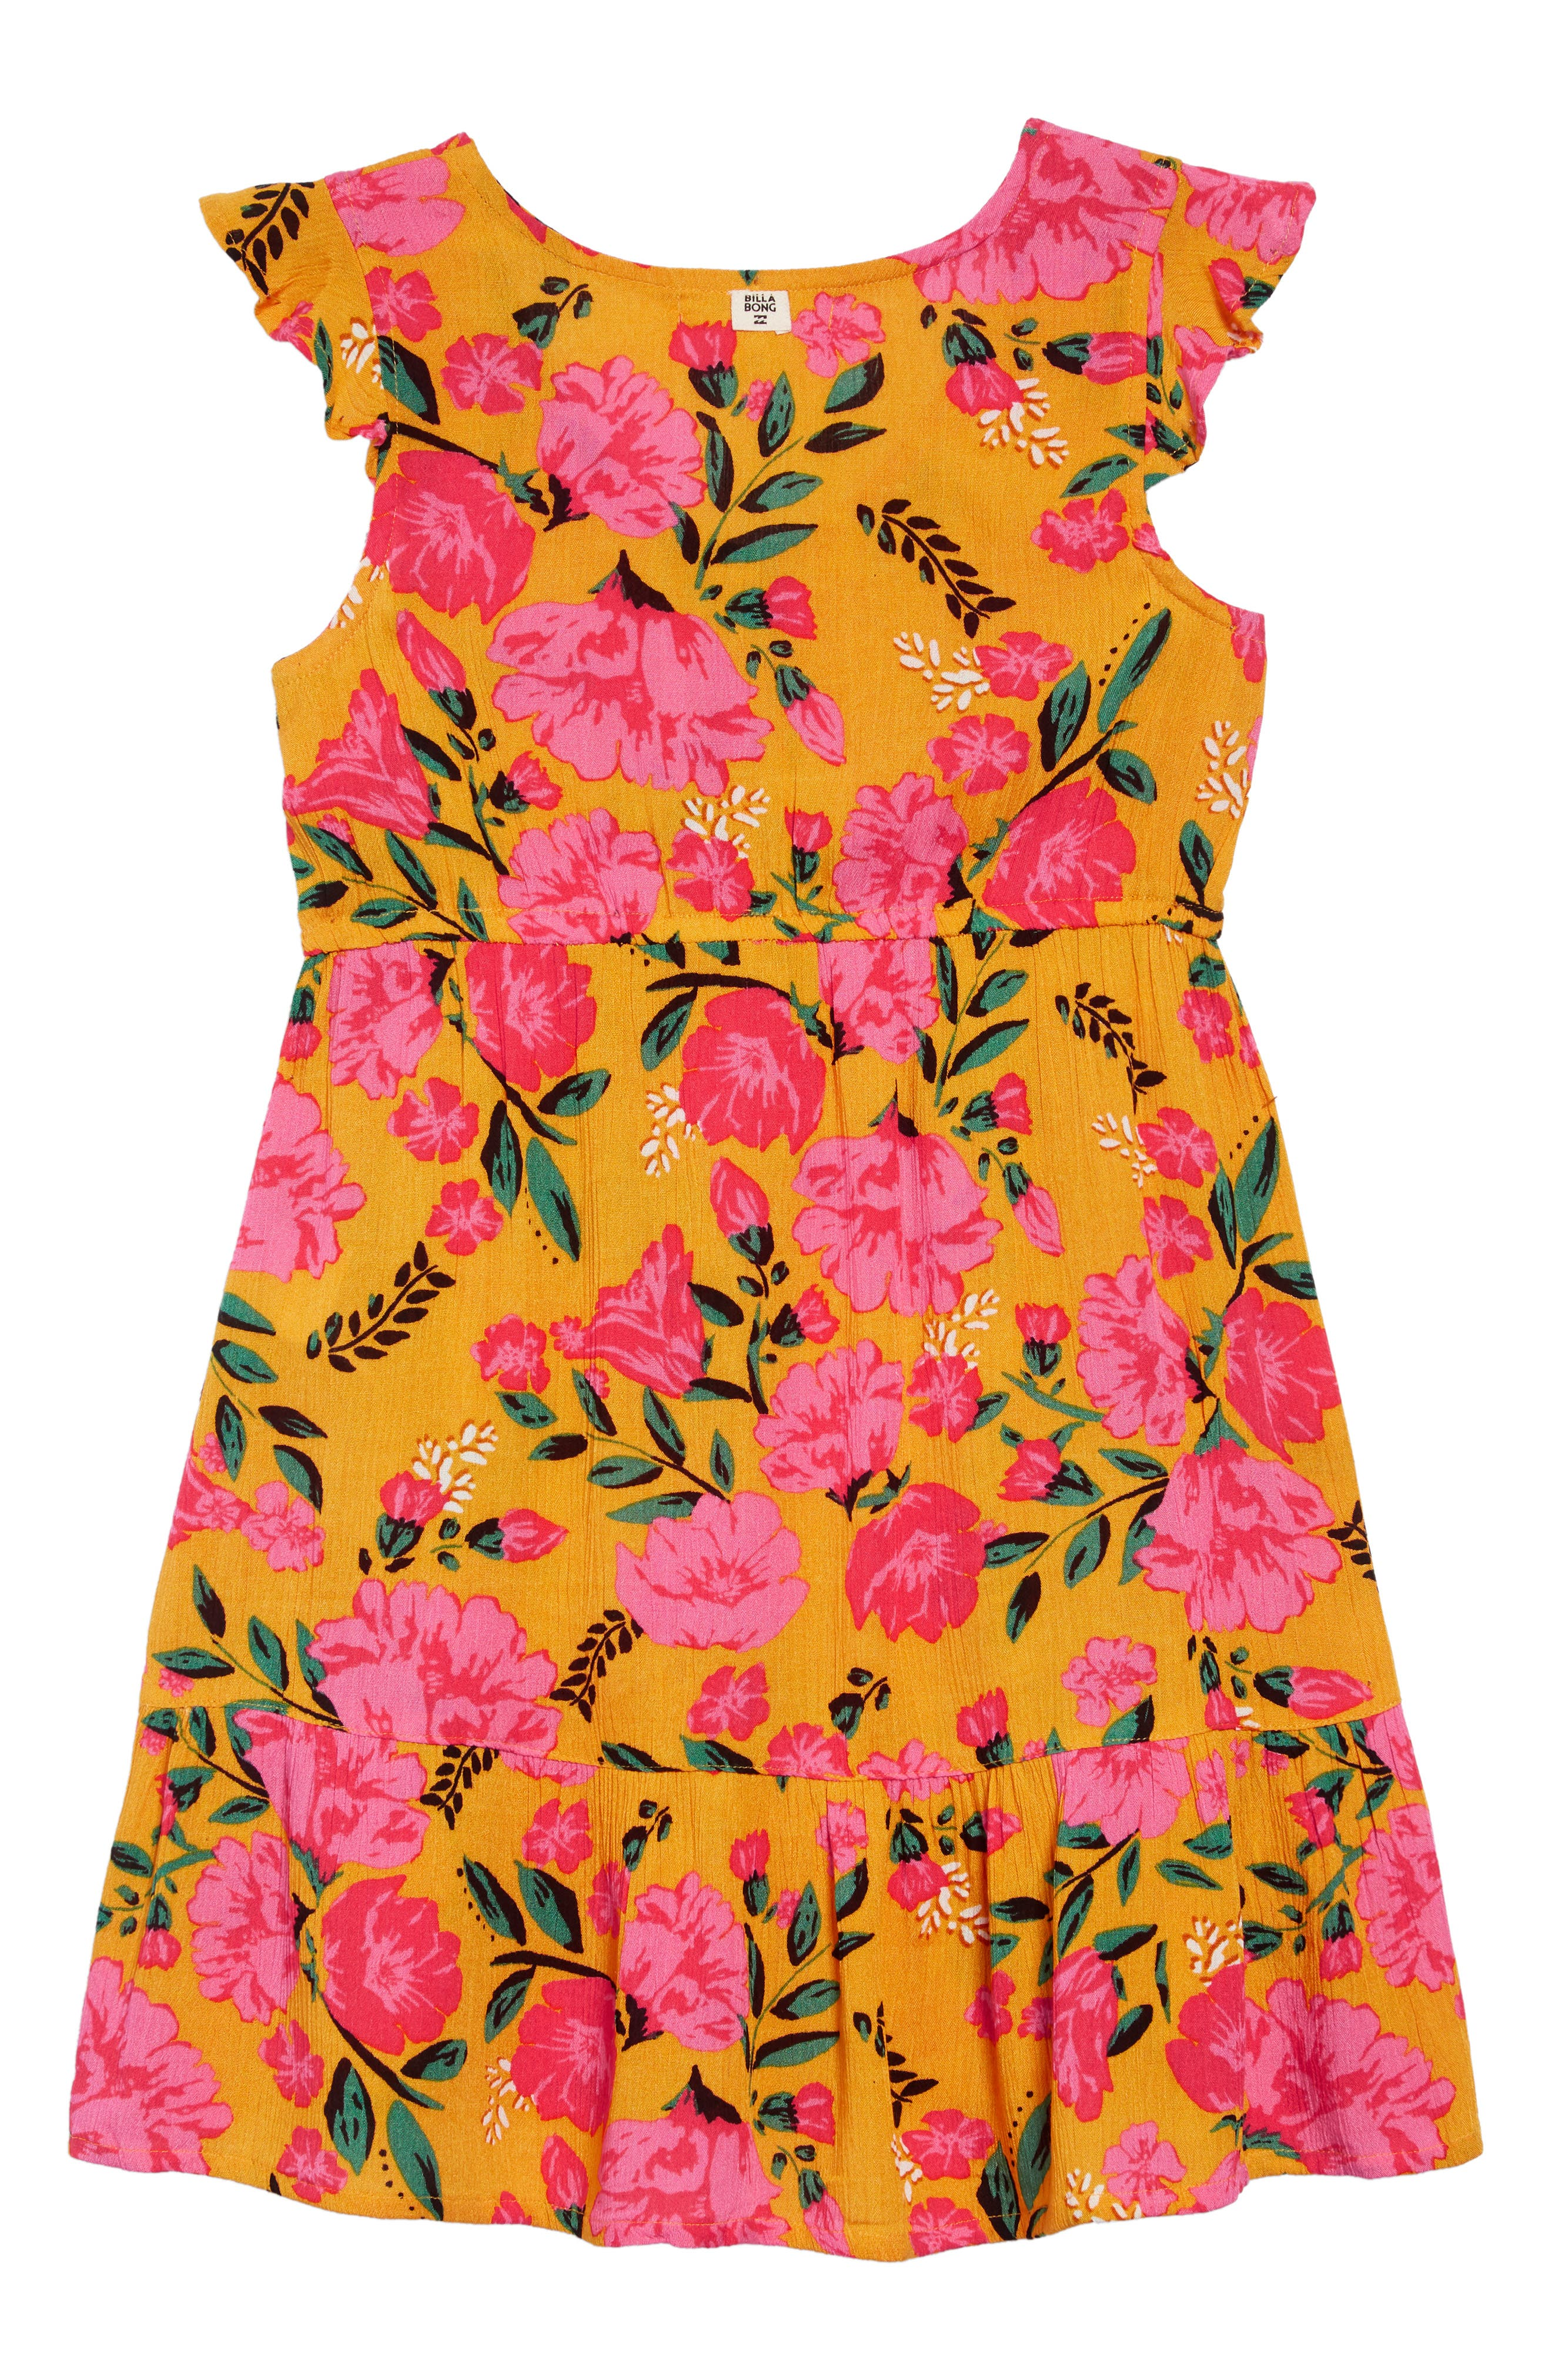 BILLABONG, Sing It Print Dress, Alternate thumbnail 2, color, 720